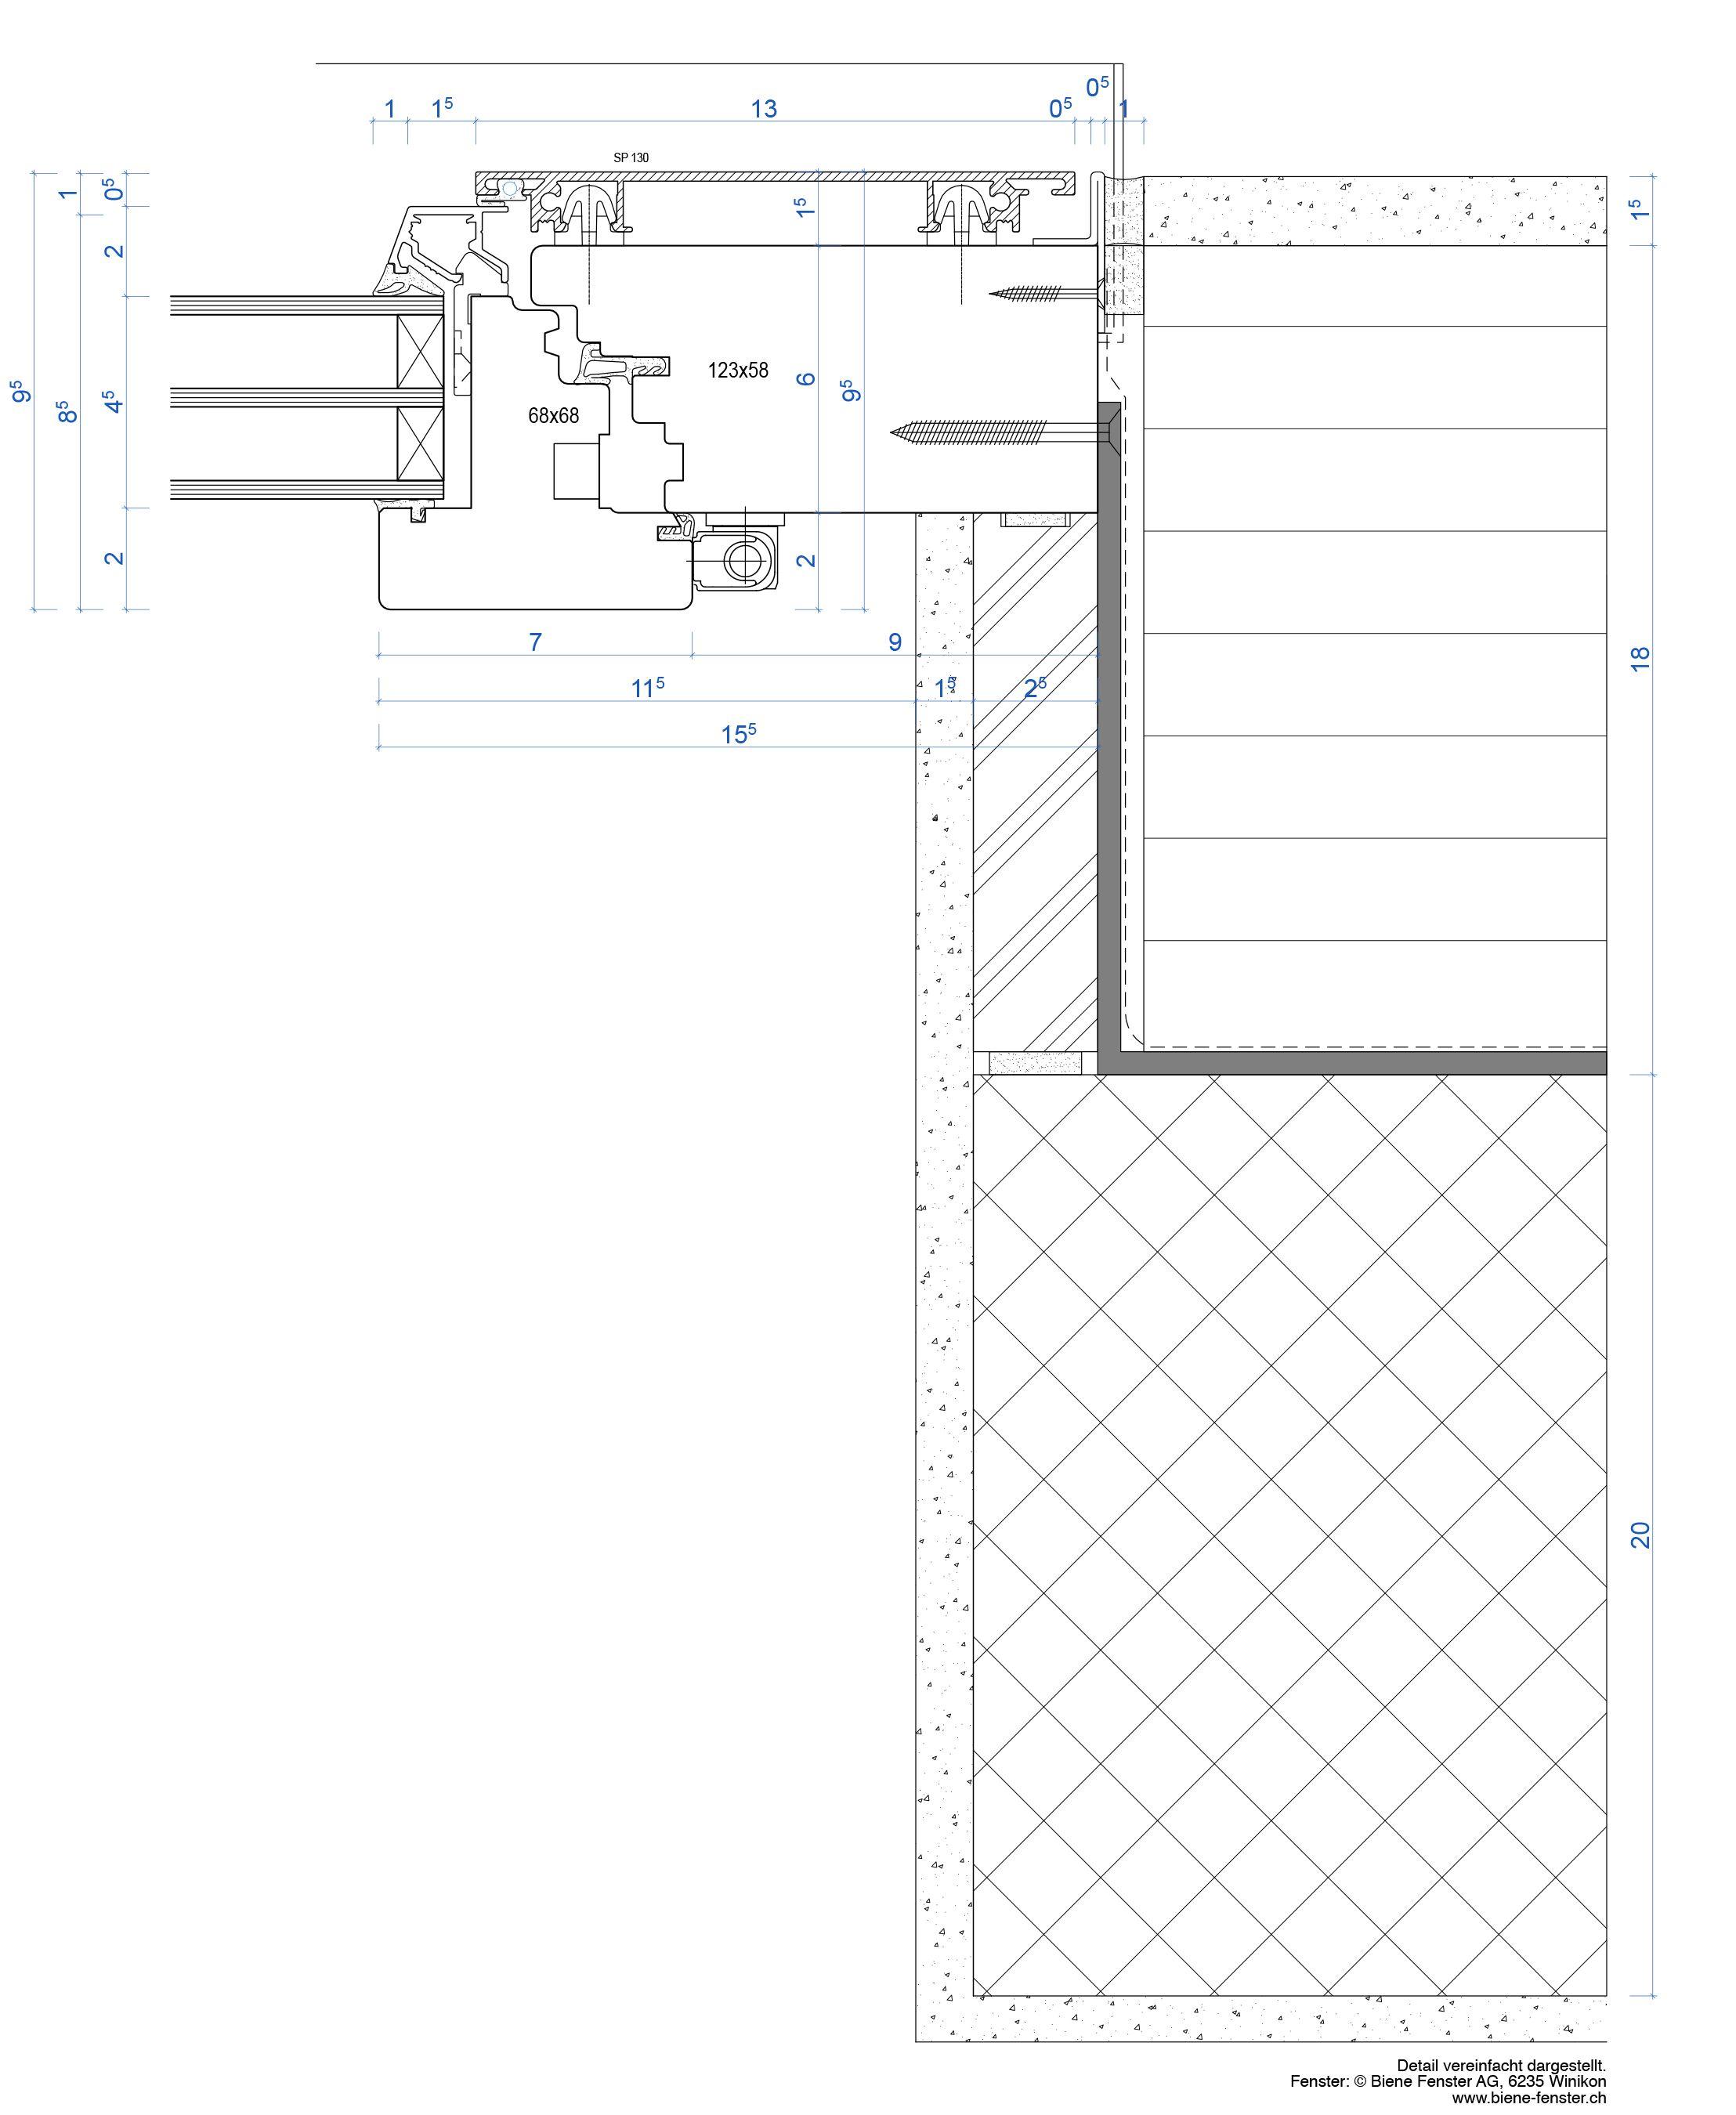 Holzbau detail fenster  ETH Zürich | D-ARCH / BUK / Dokumentation / Fenster aussenbündig ...